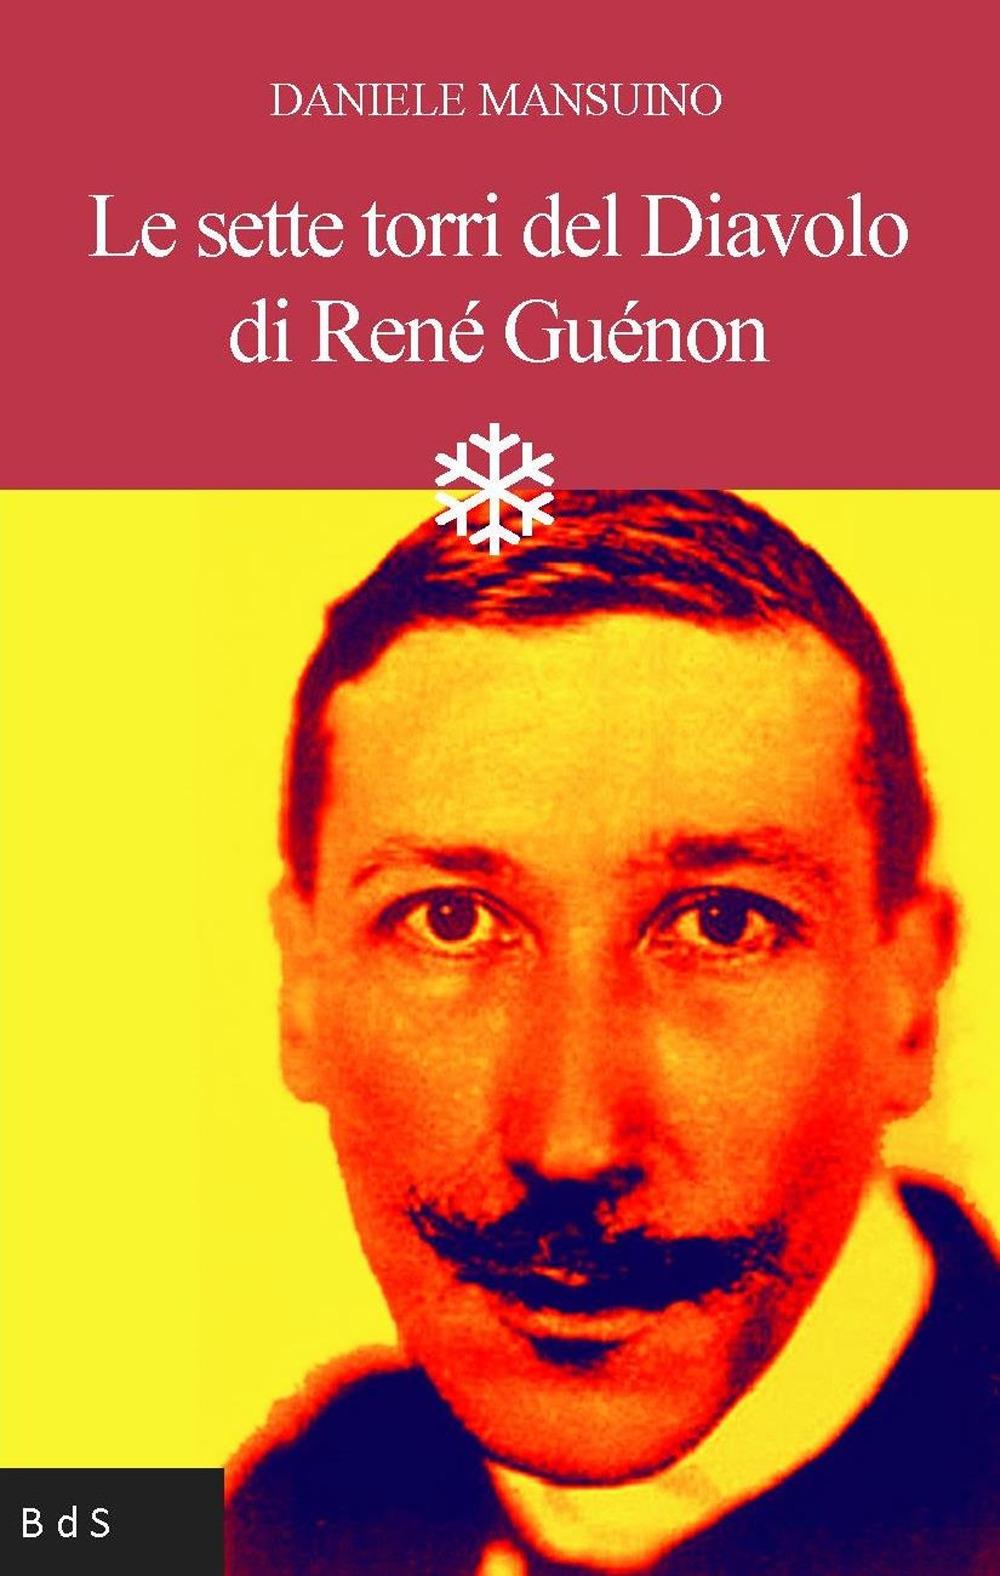 Le sette torri del diavolo di René Guénon